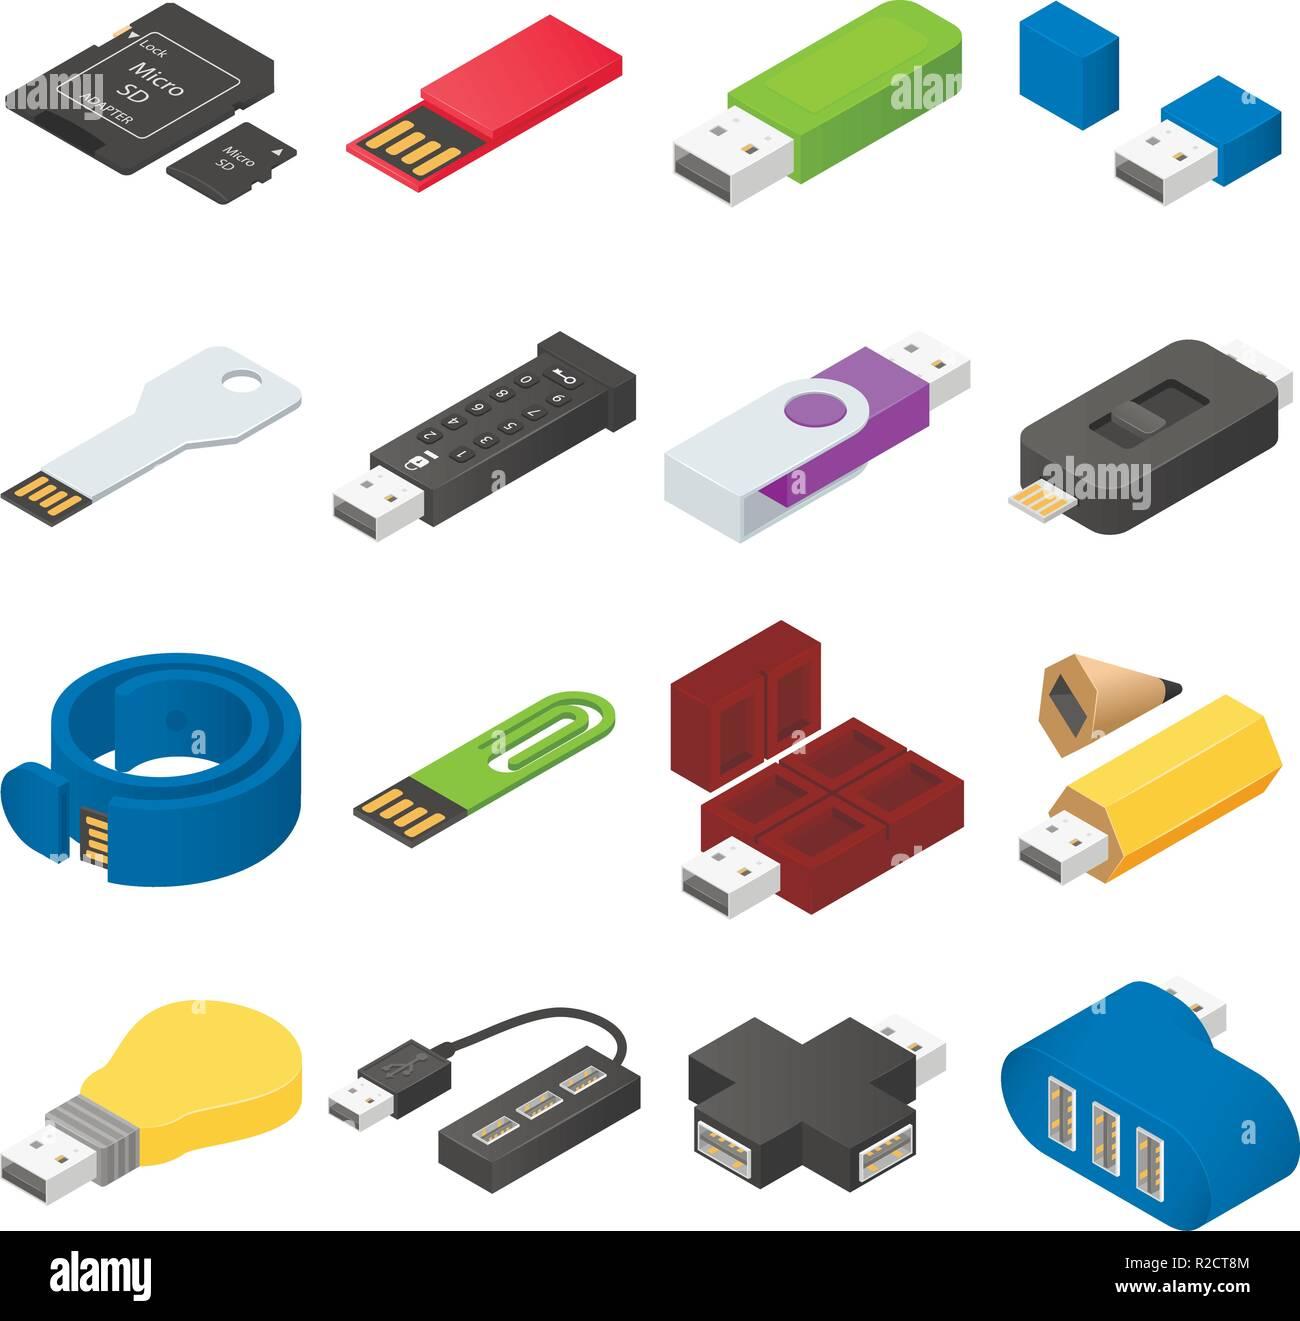 USB flash drive icons set. Isometric illustration of 16 USB flash drive vector icons for web - Stock Image